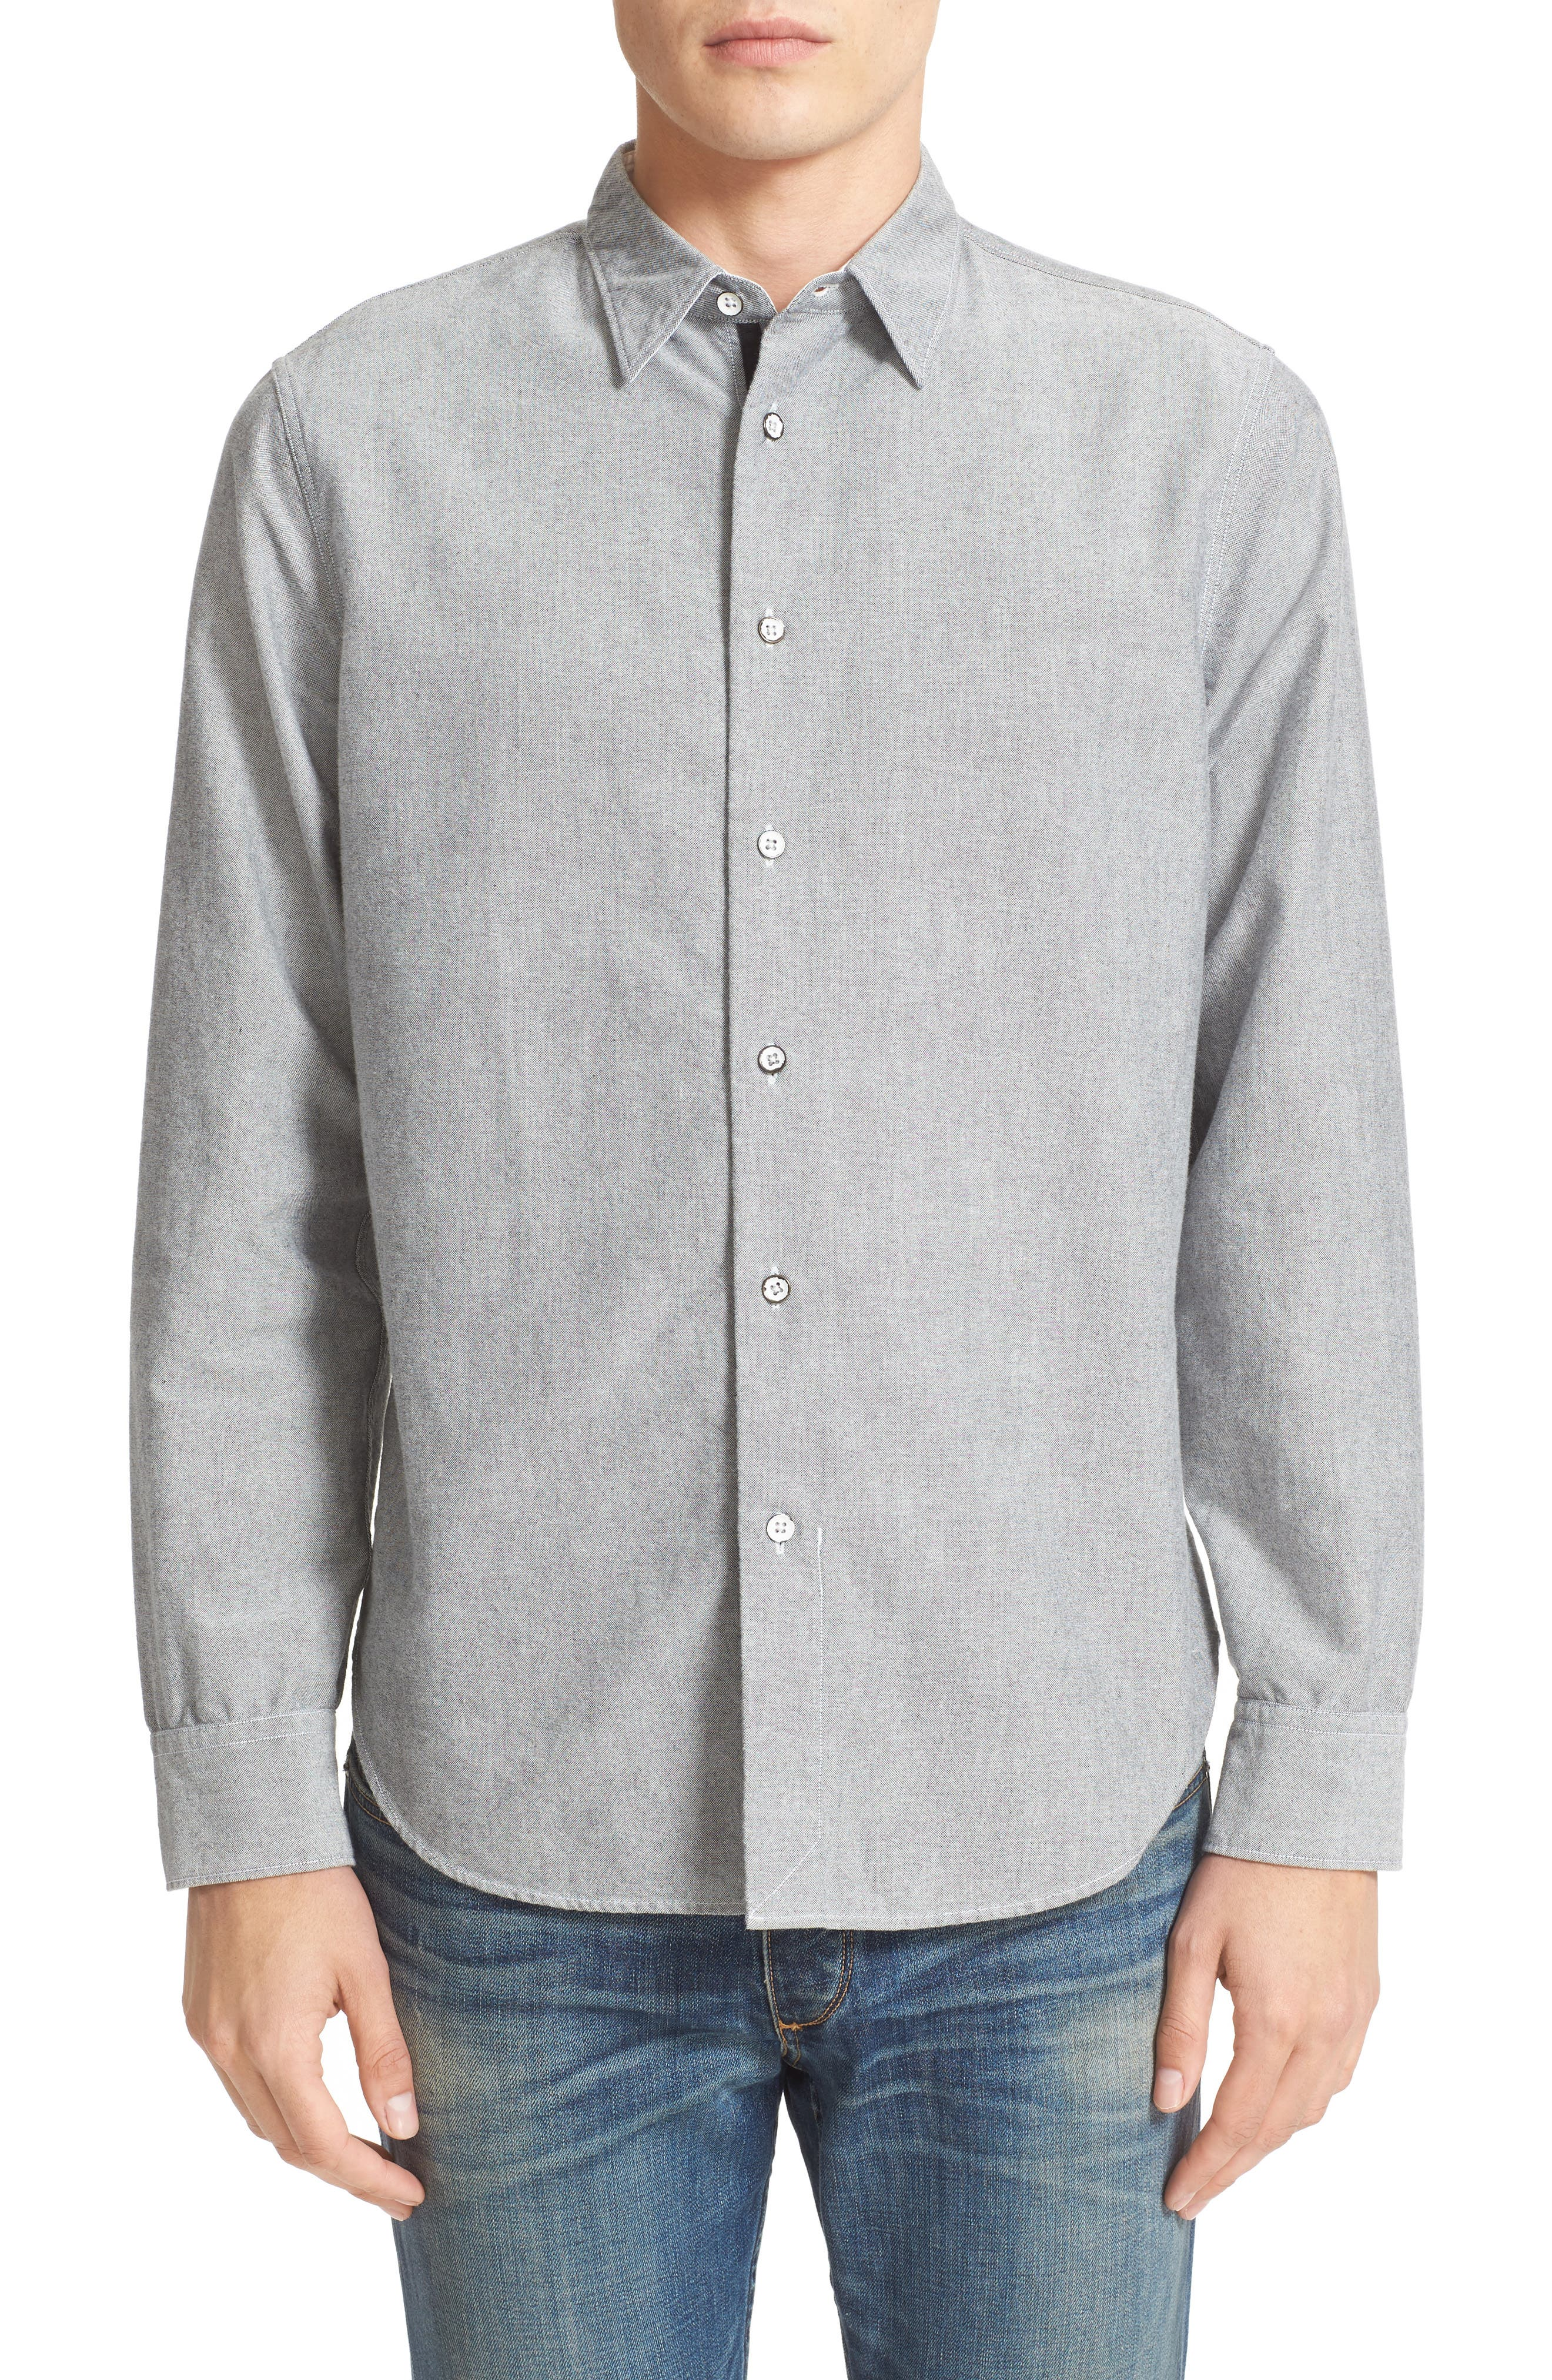 Alternate Image 1 Selected - rag & bone Beach Trim Fit Oxford Sport Shirt